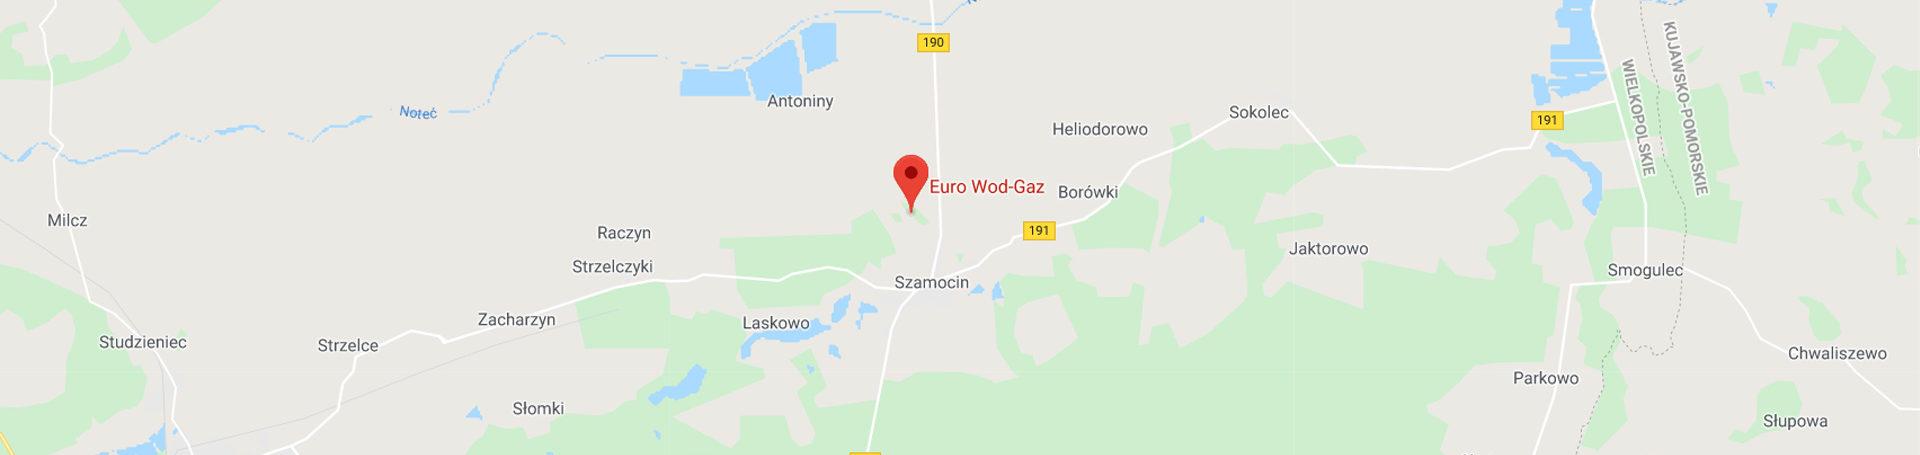 http://eurowodgaz.pl/wp-content/uploads/2020/02/mapa-1-1920x455.jpg